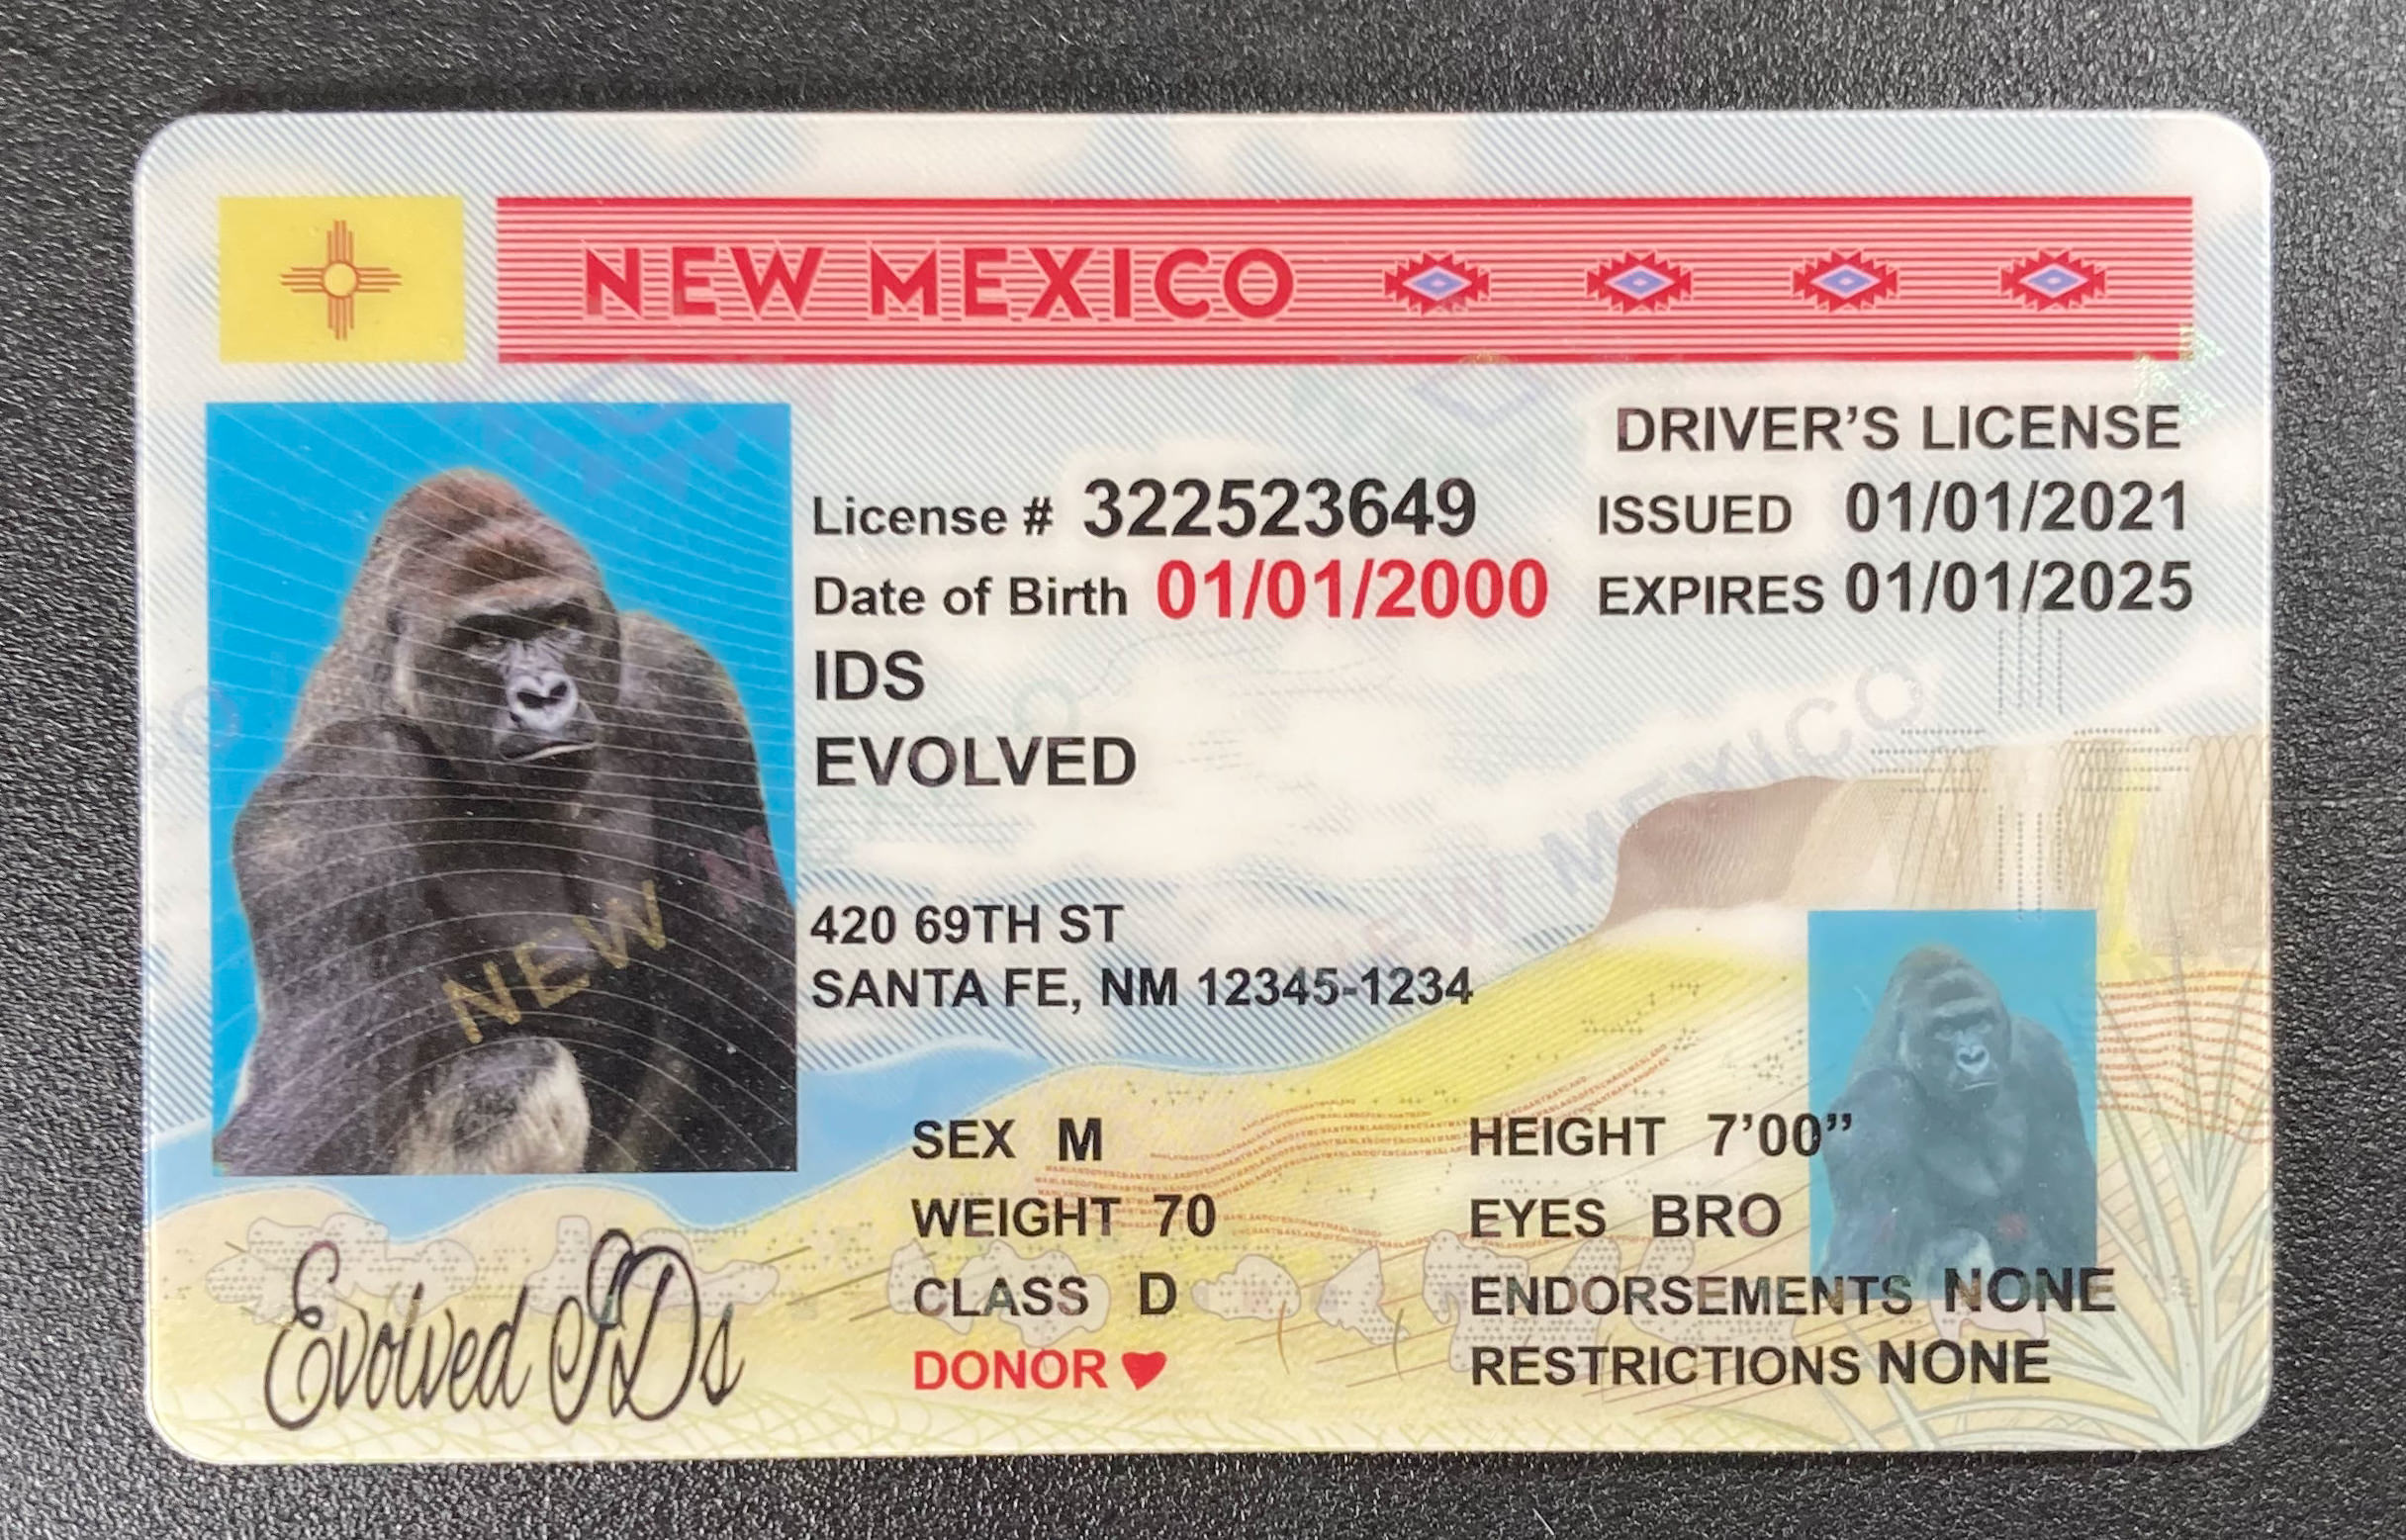 New Mexico Fake ID